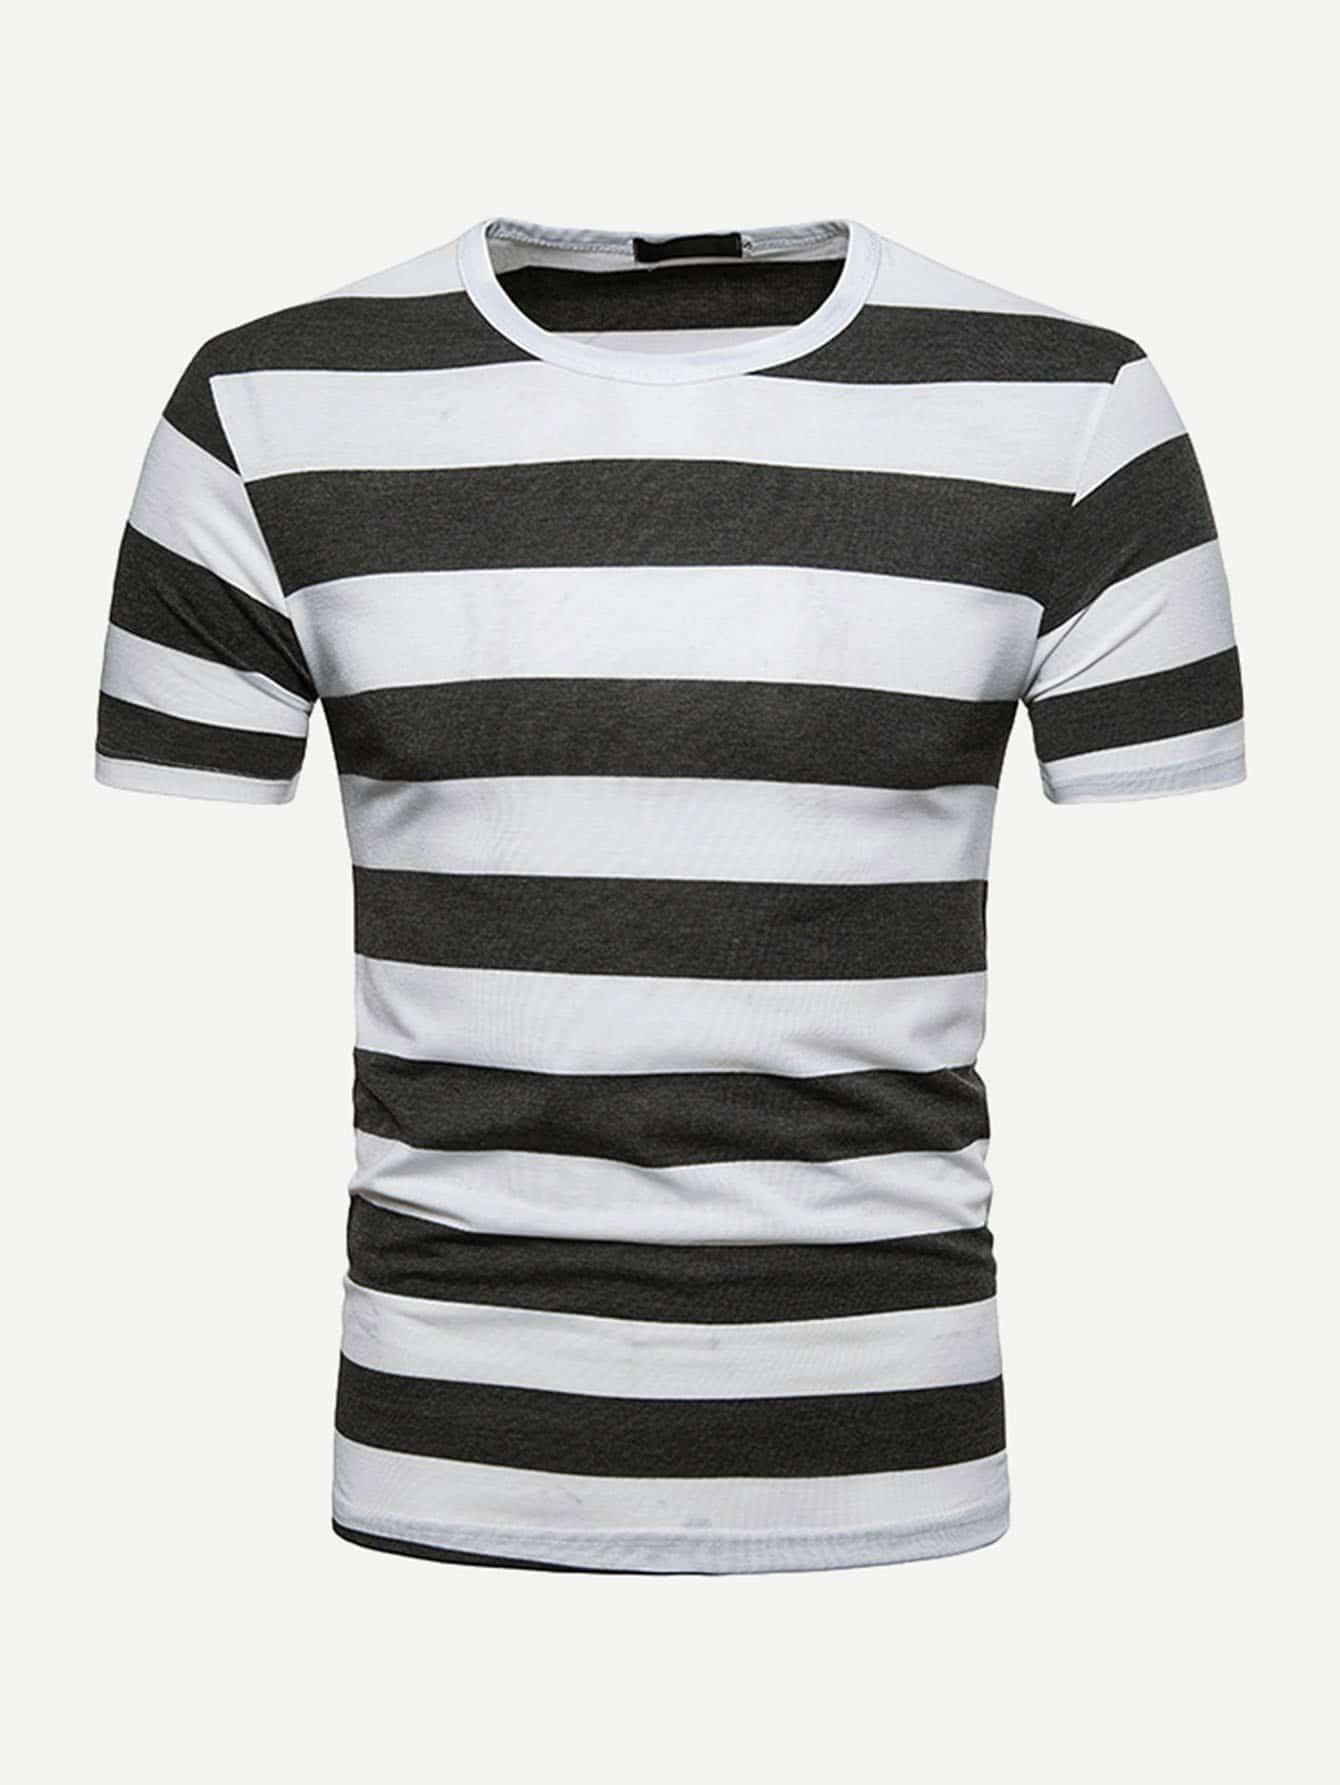 Men Striped Tee men rainbow striped tee